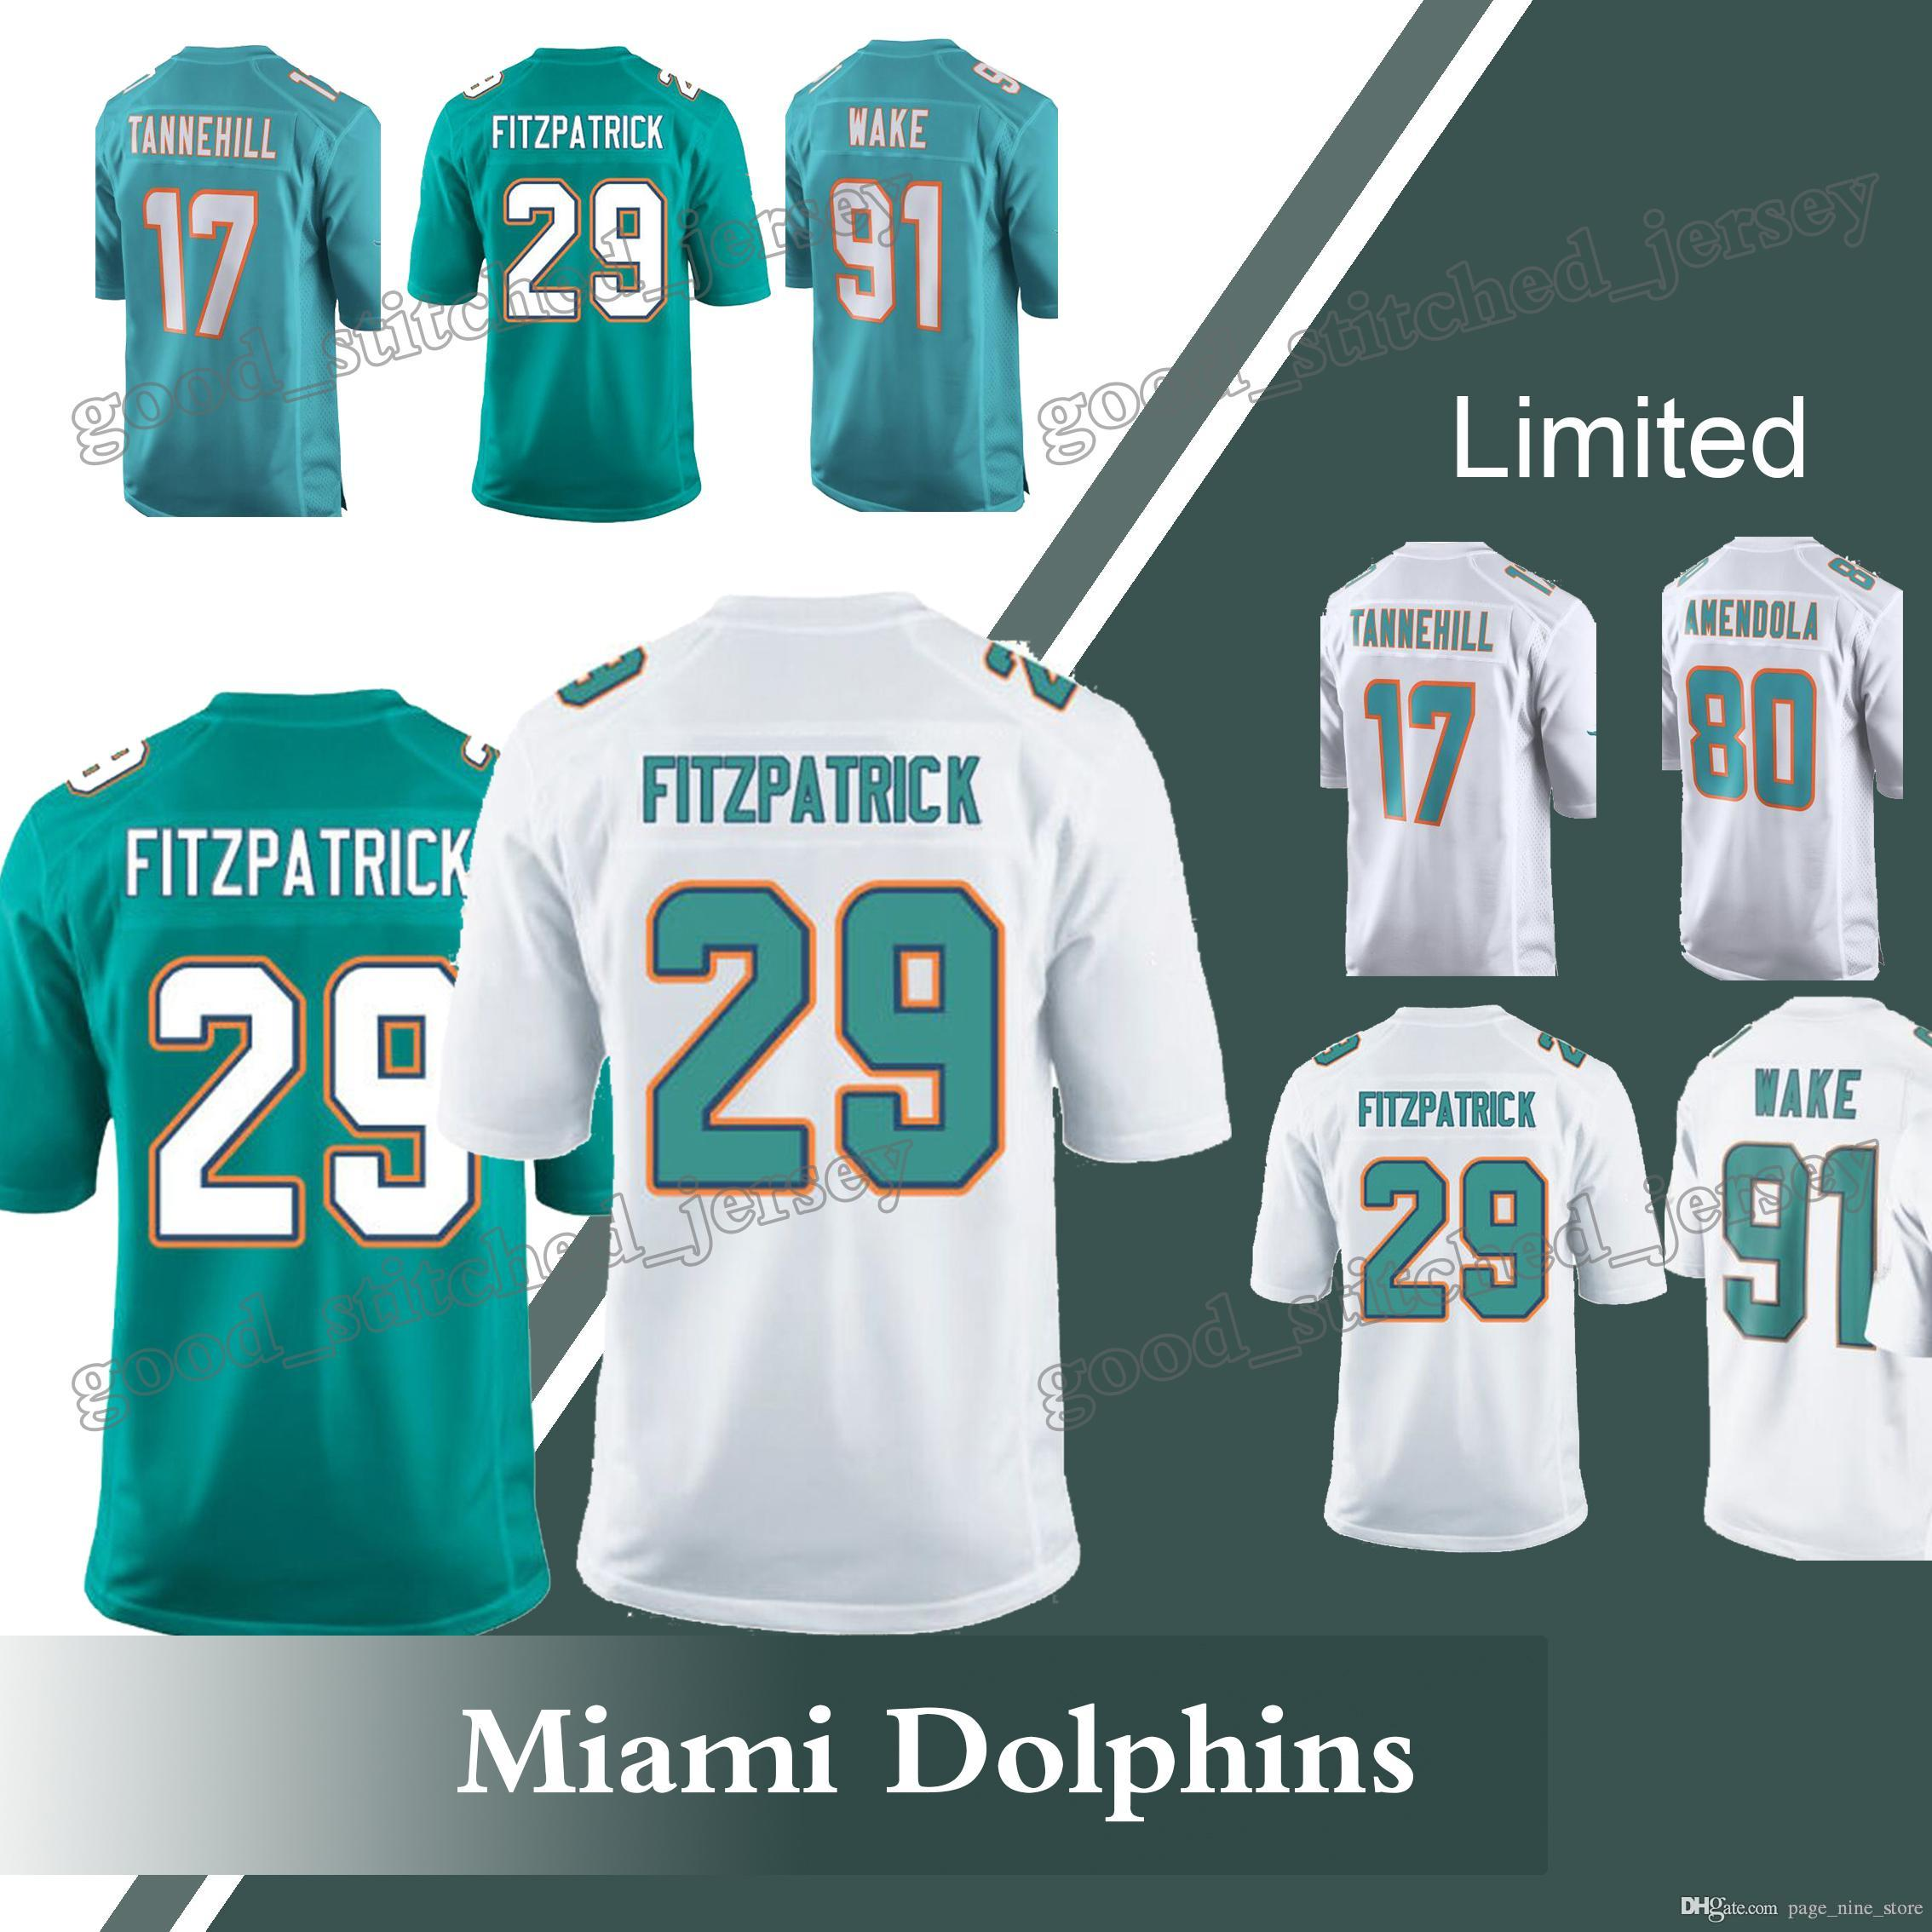 minkah fitzpatrick miami dolphins jersey